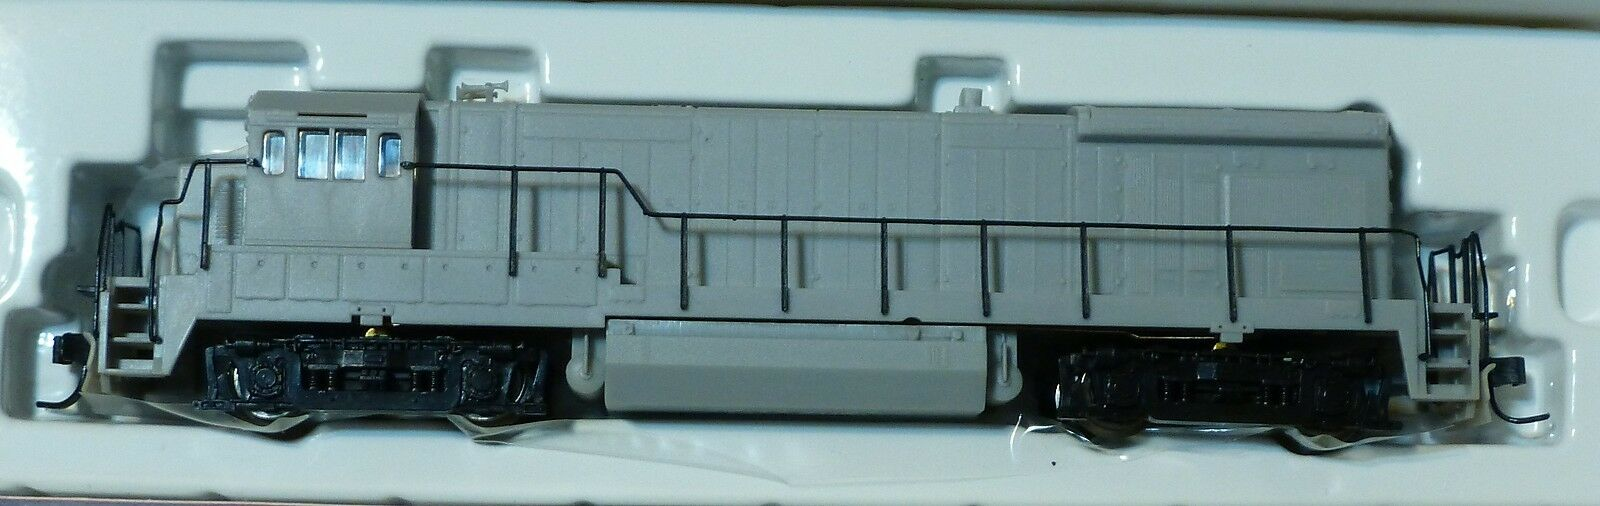 Atlas N Diesel GE B30-7 Powered -- Undecorated w Flat Rear Headlight, AA